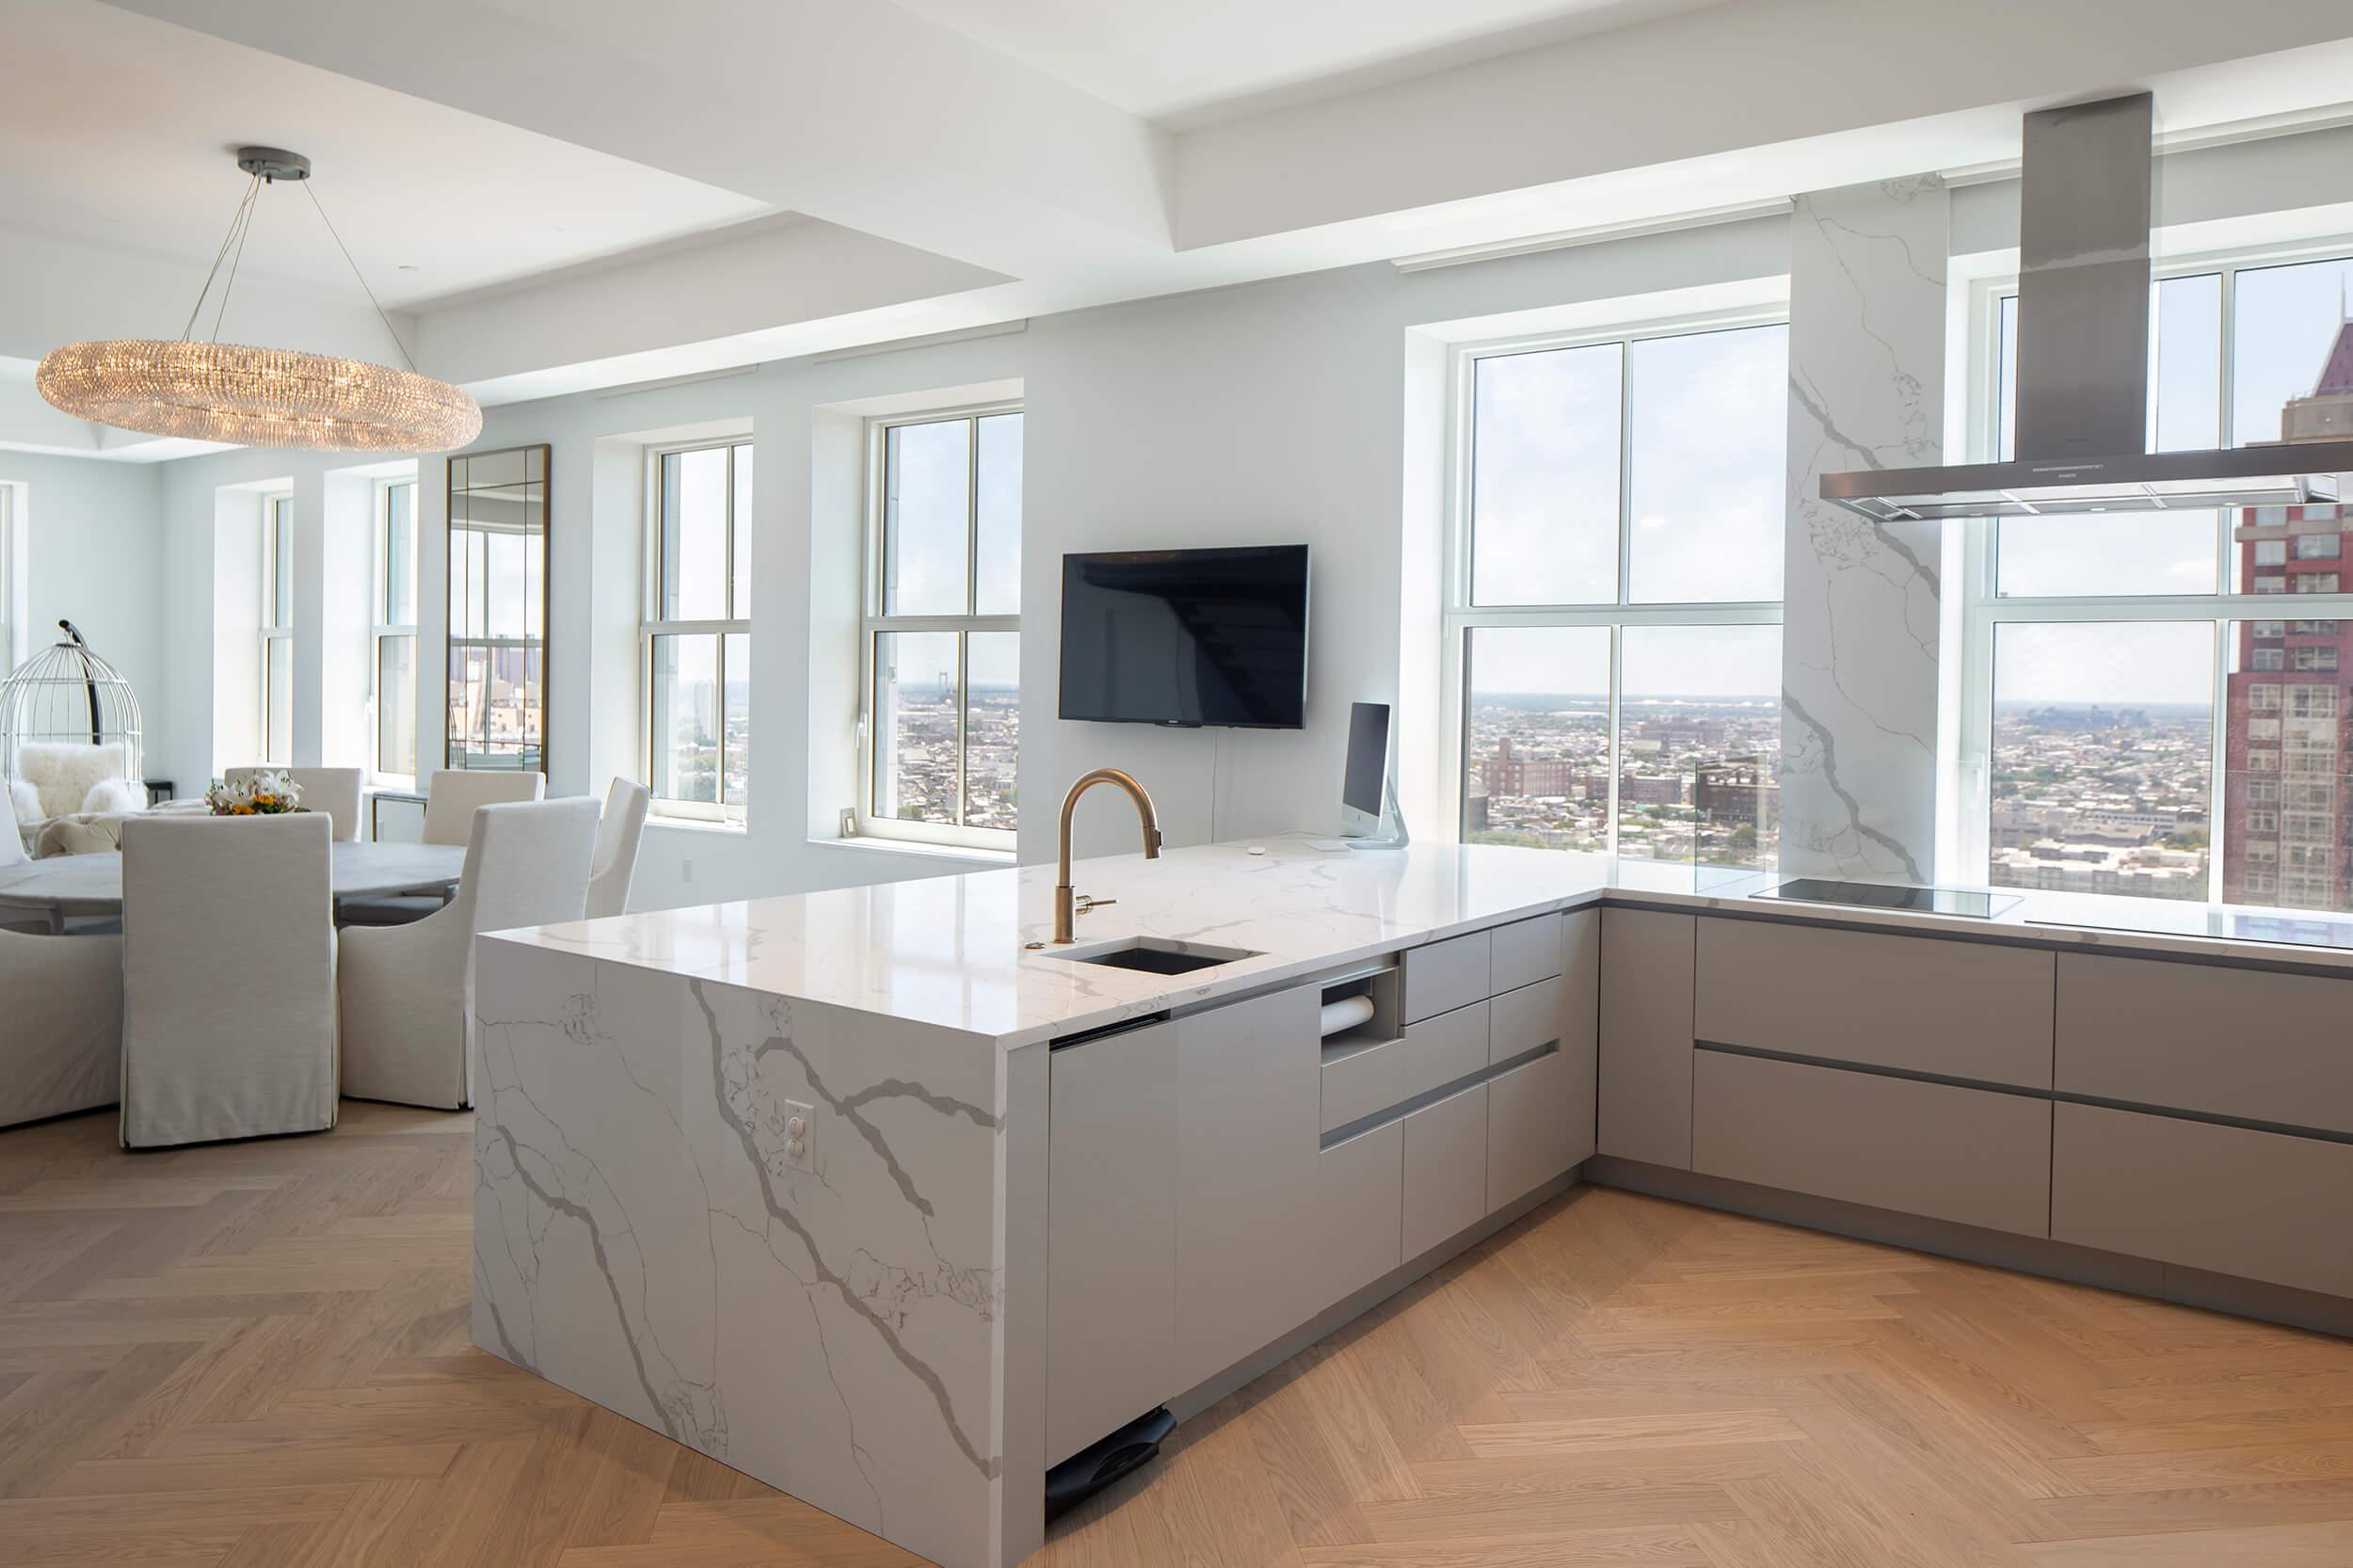 4BR Penthouse Kitchen